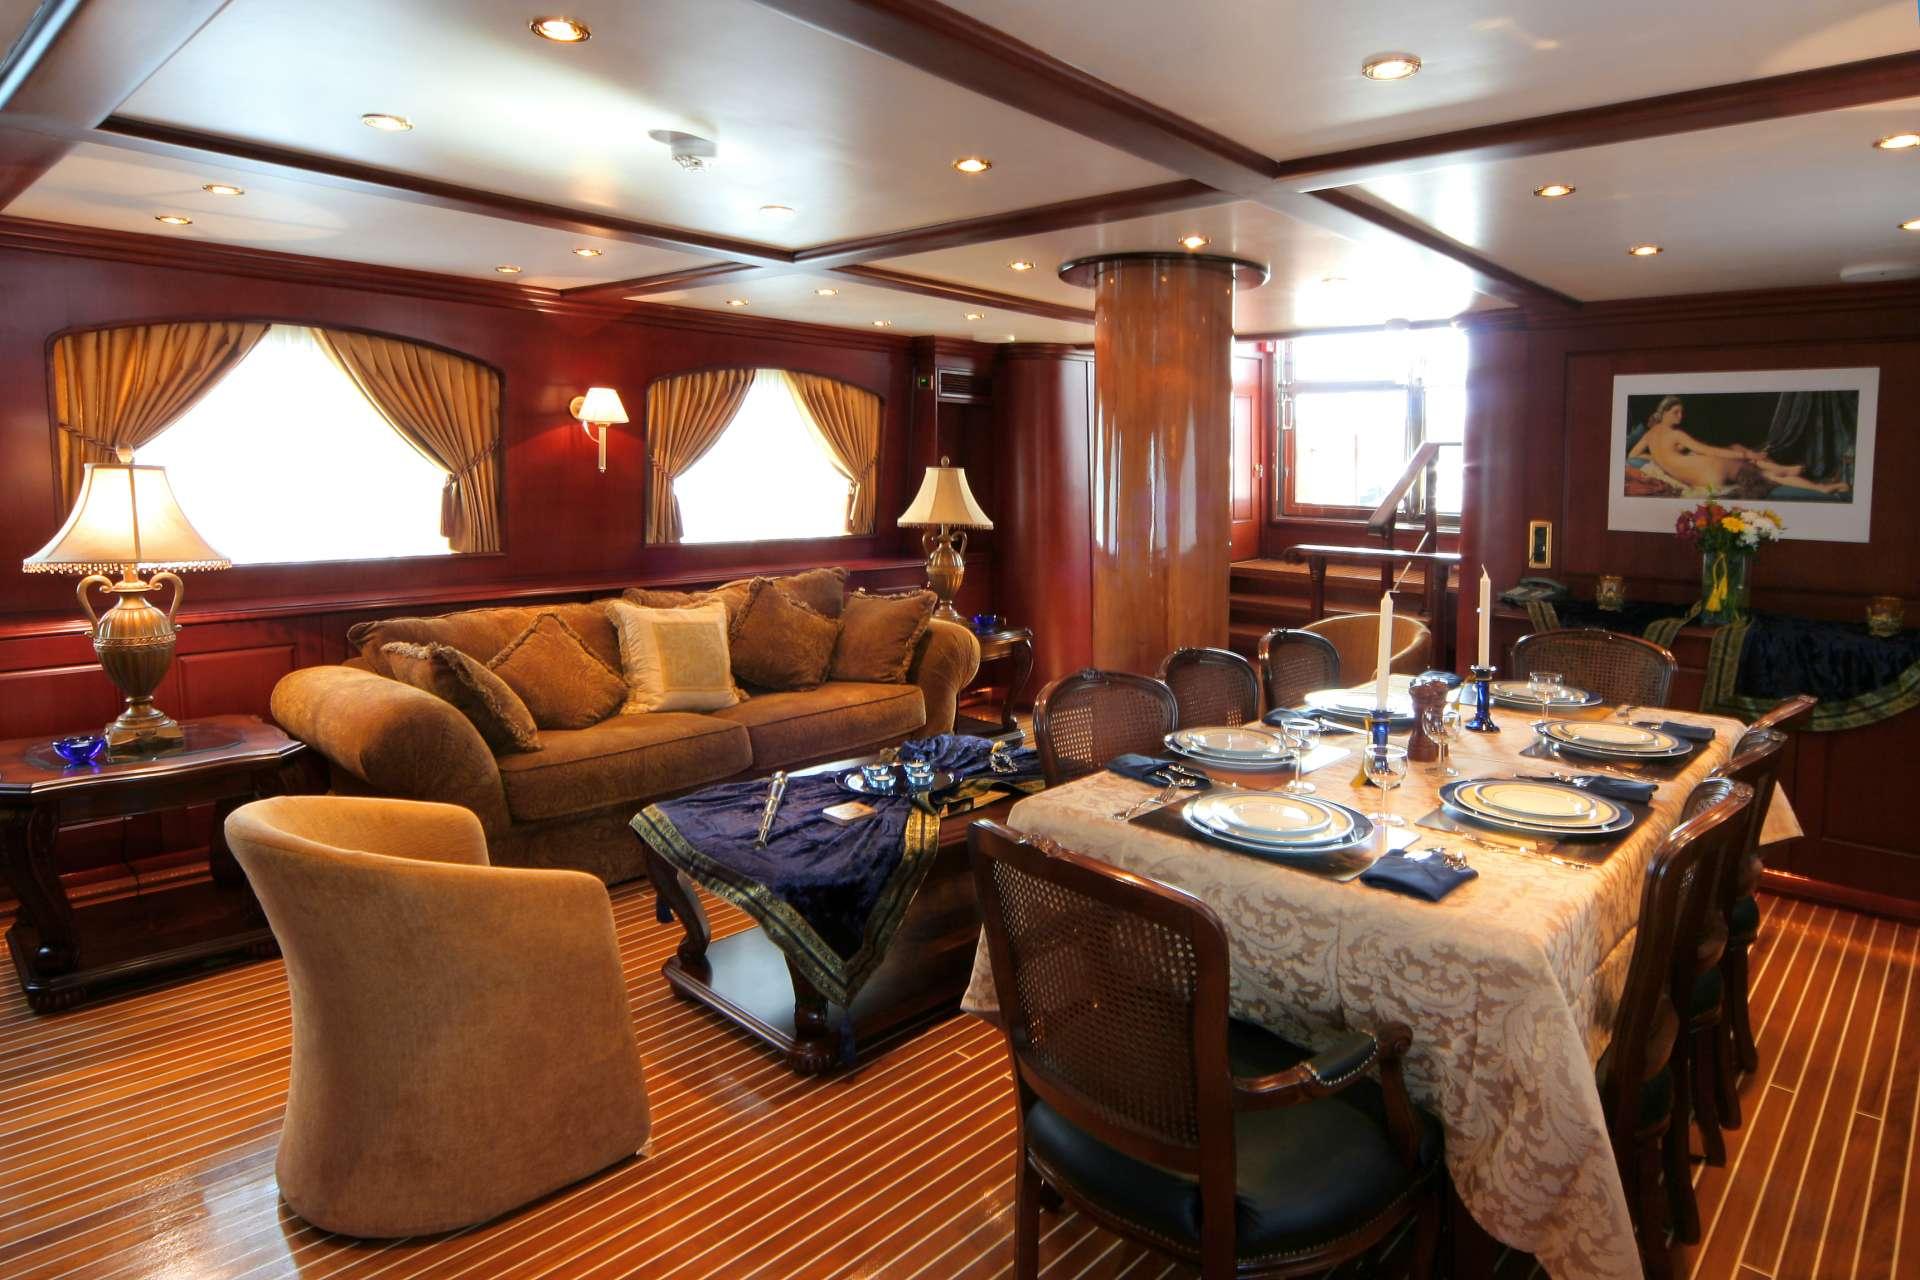 Motors Yacht 'Motors', 10 PAX, 4 Crew, 98.00 Ft, 30.00 Meters, Built 2004, Custom, Refit Year 2017